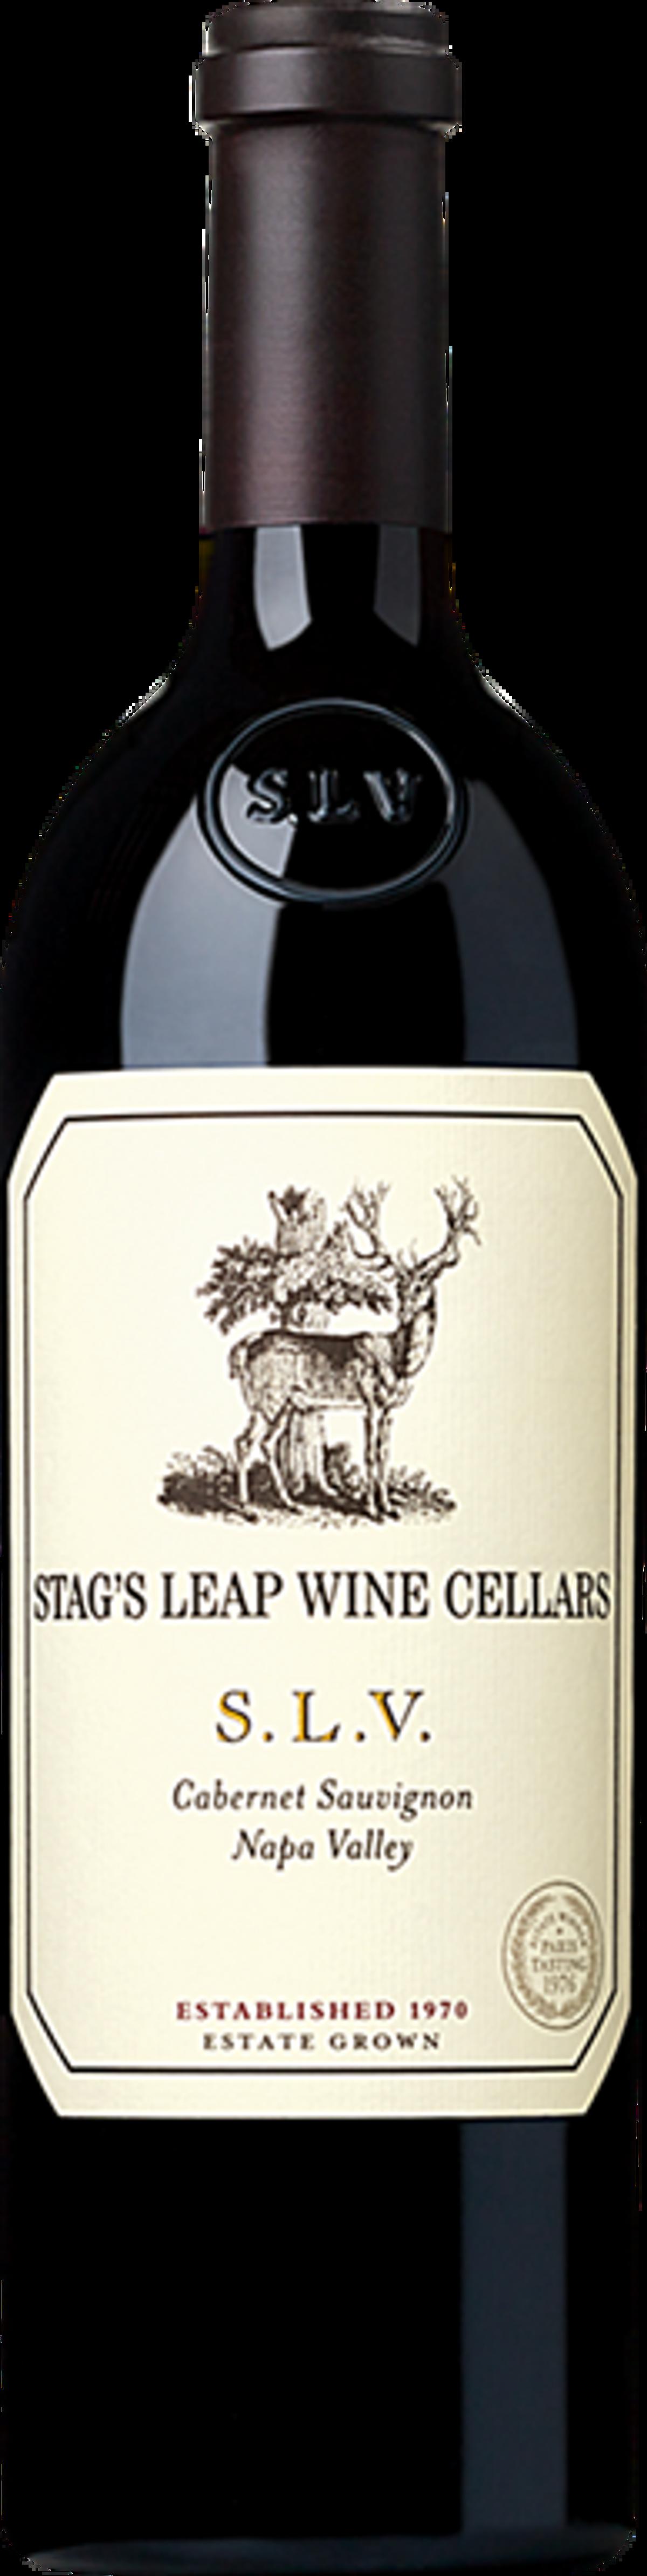 stags leap wine cellars 2018 slv cabernet sauvignon